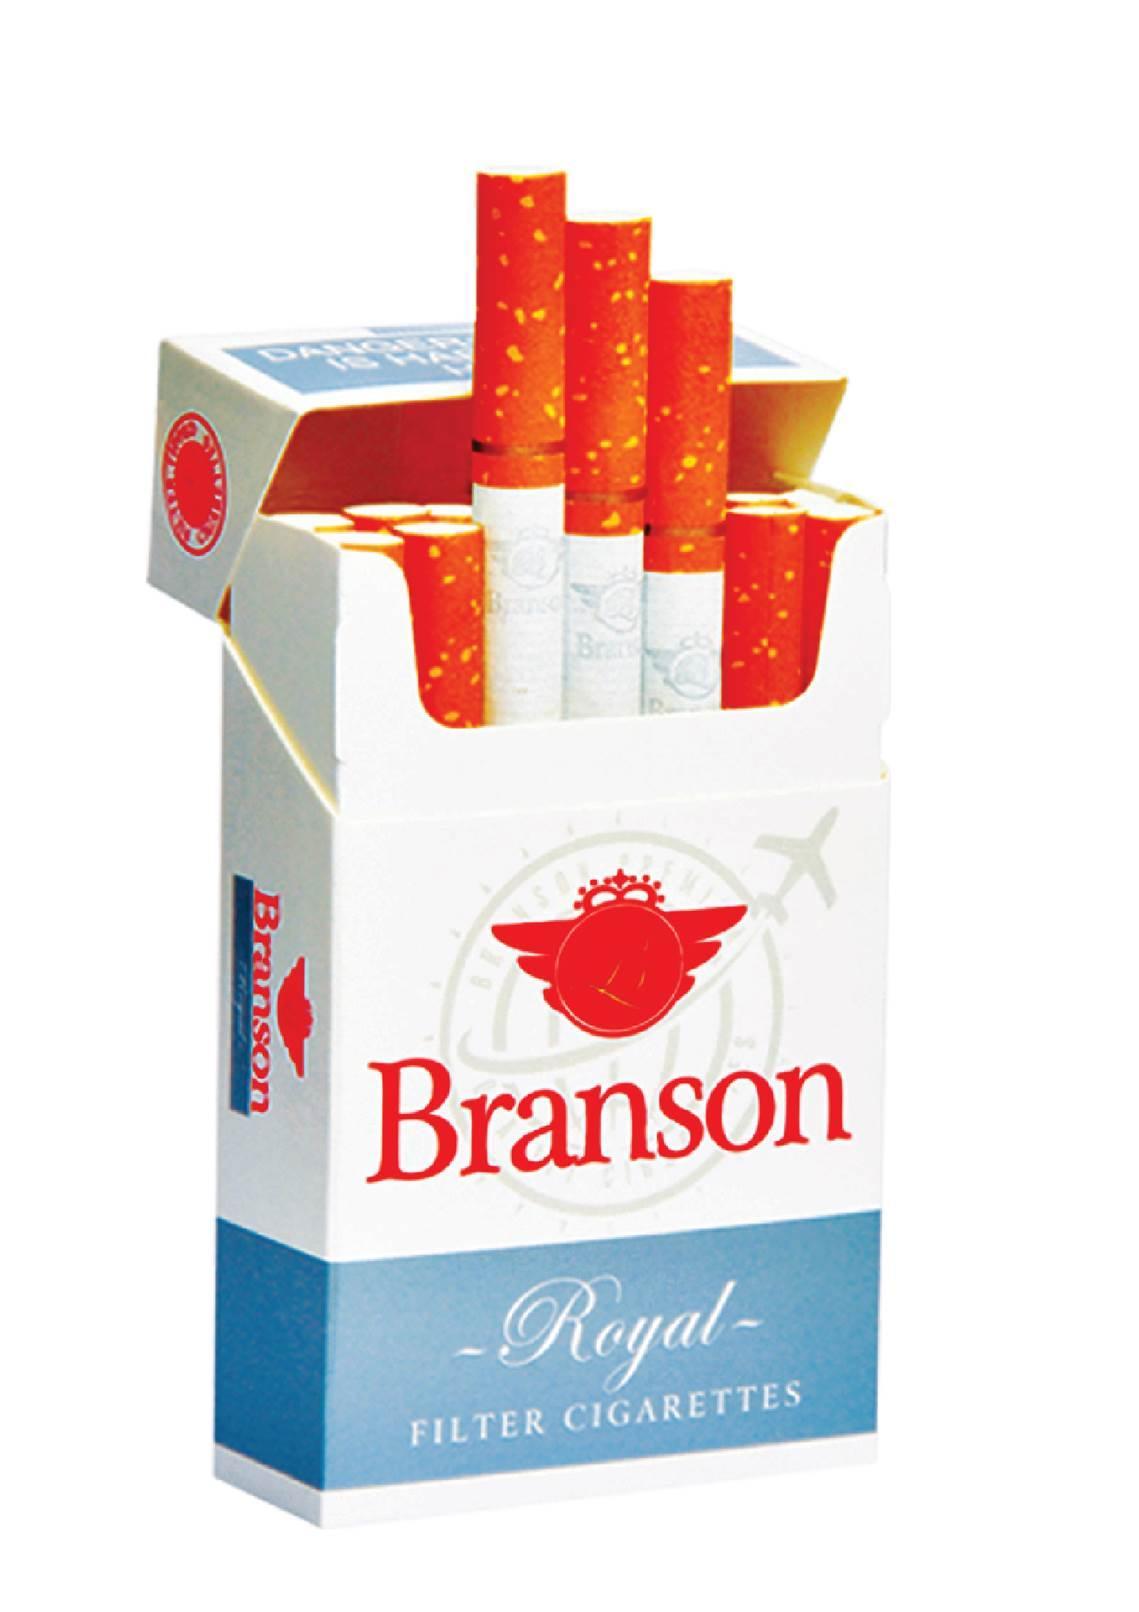 Branson Royal